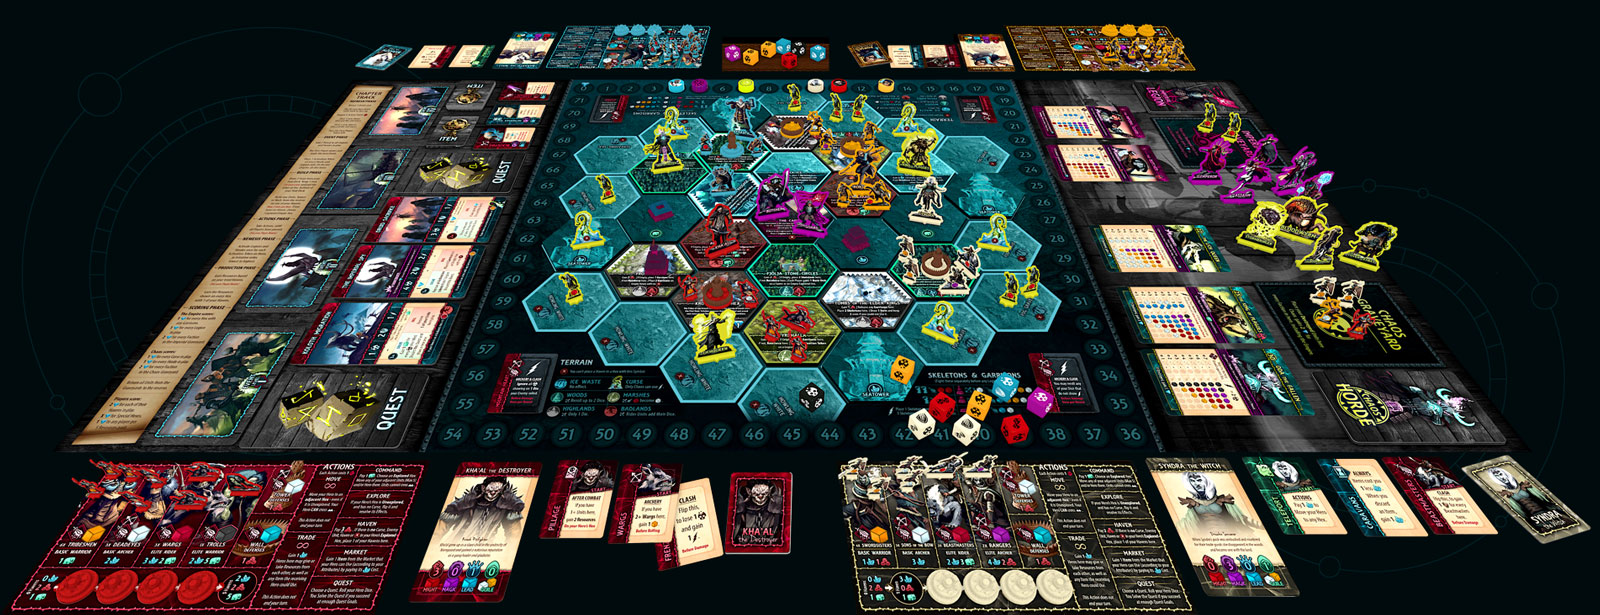 Uprising Curse of the Last Emperor Game Setup